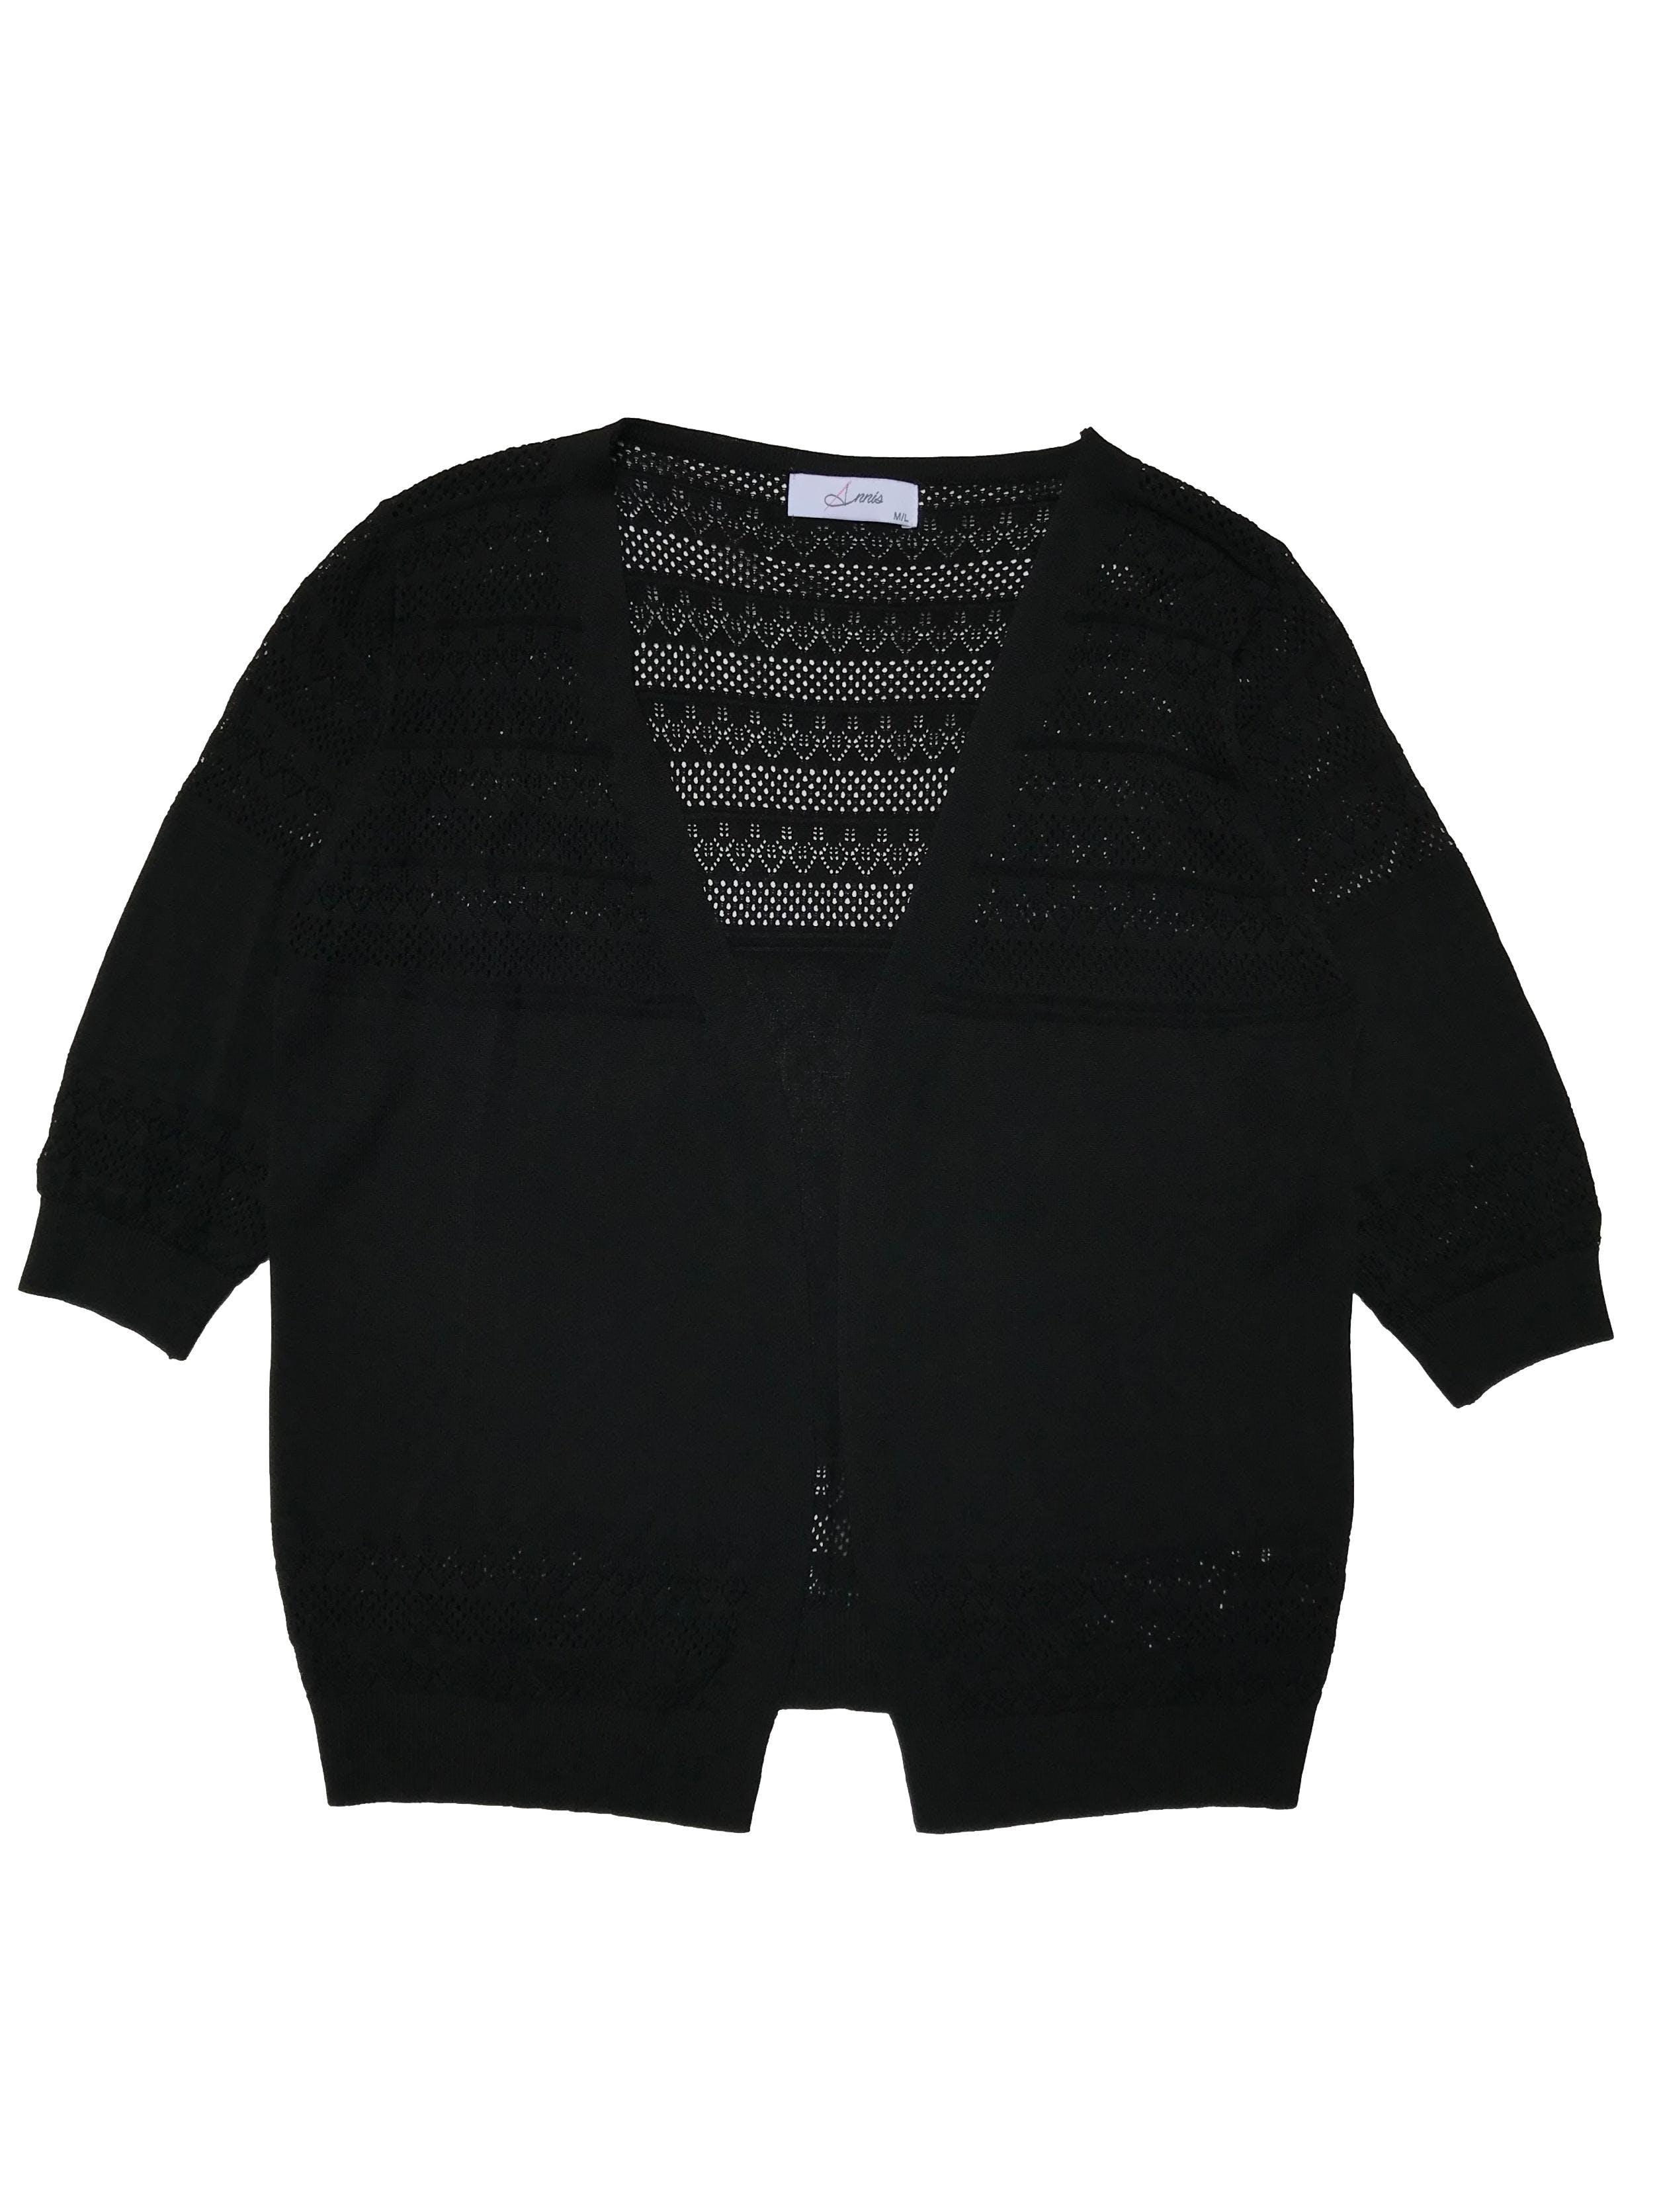 Cardigan de hilo negro con detalles calados, manga 3/4, modelo abierto. Largo 60cm